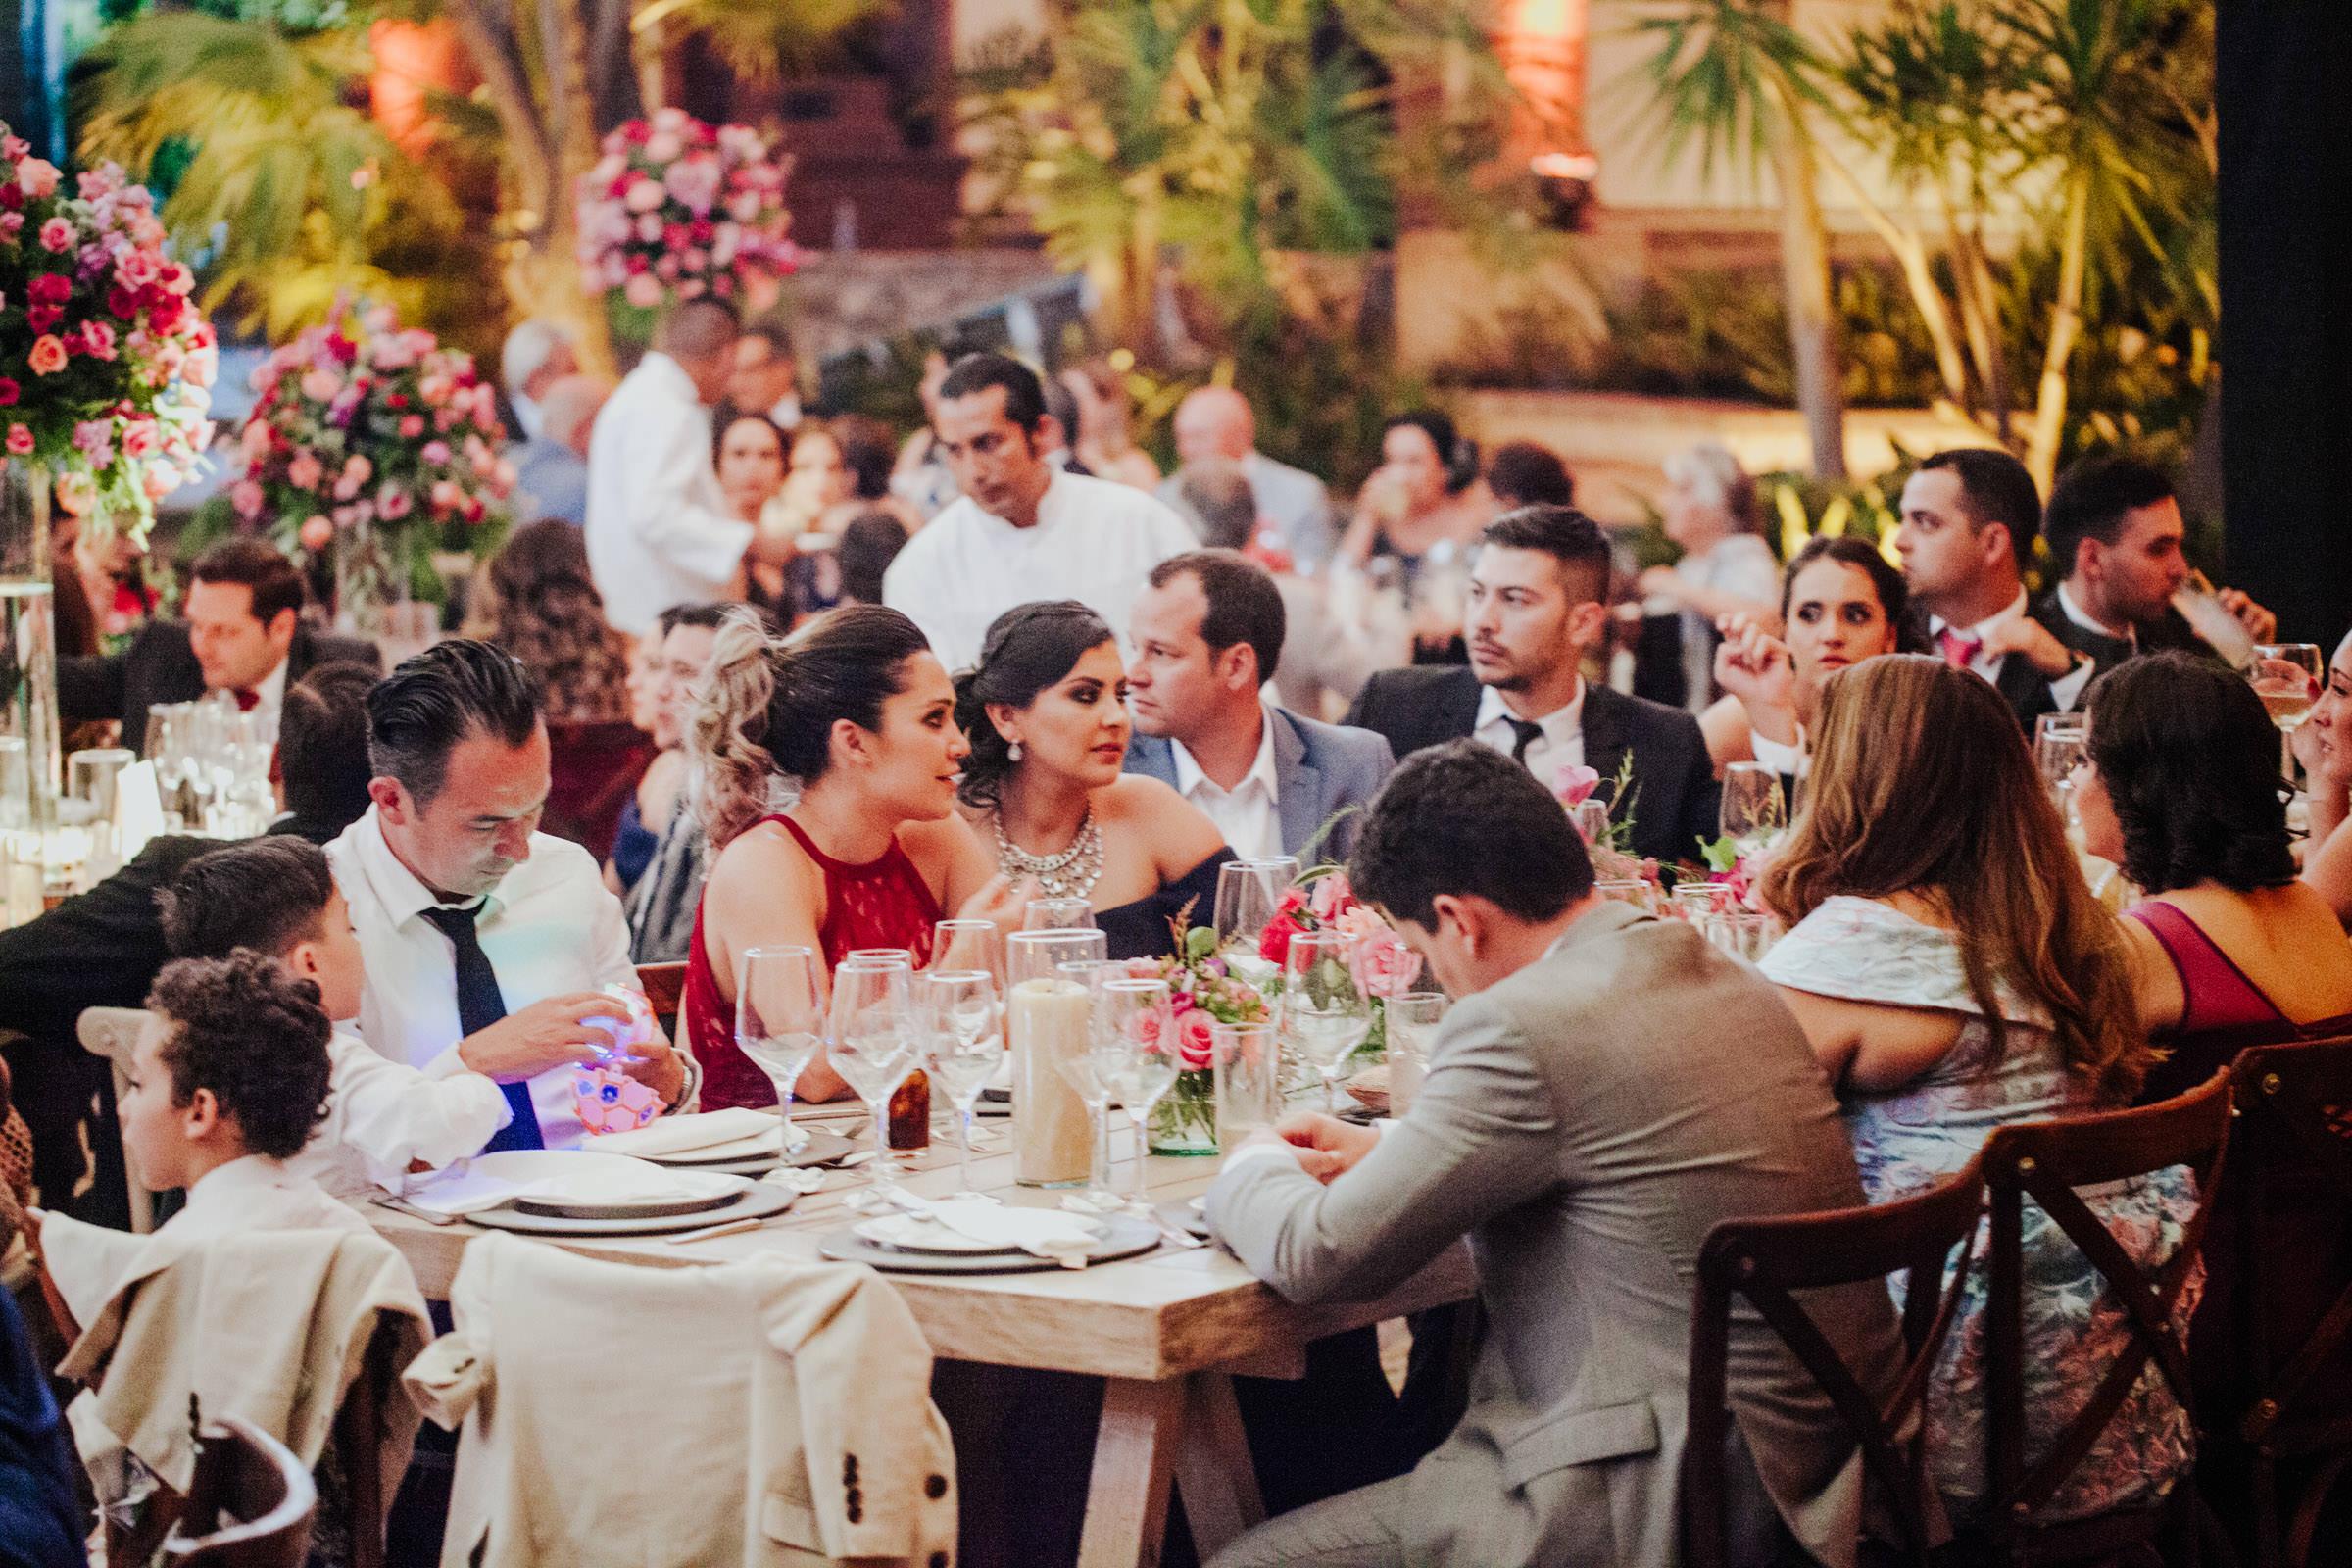 San-Miguel-de-Allende-Wedding-Photography-Parroquia-Instituto-Boda-Fotografia-Fer-Sergio-Pierce-Lifestyle-Photography0013.JPG